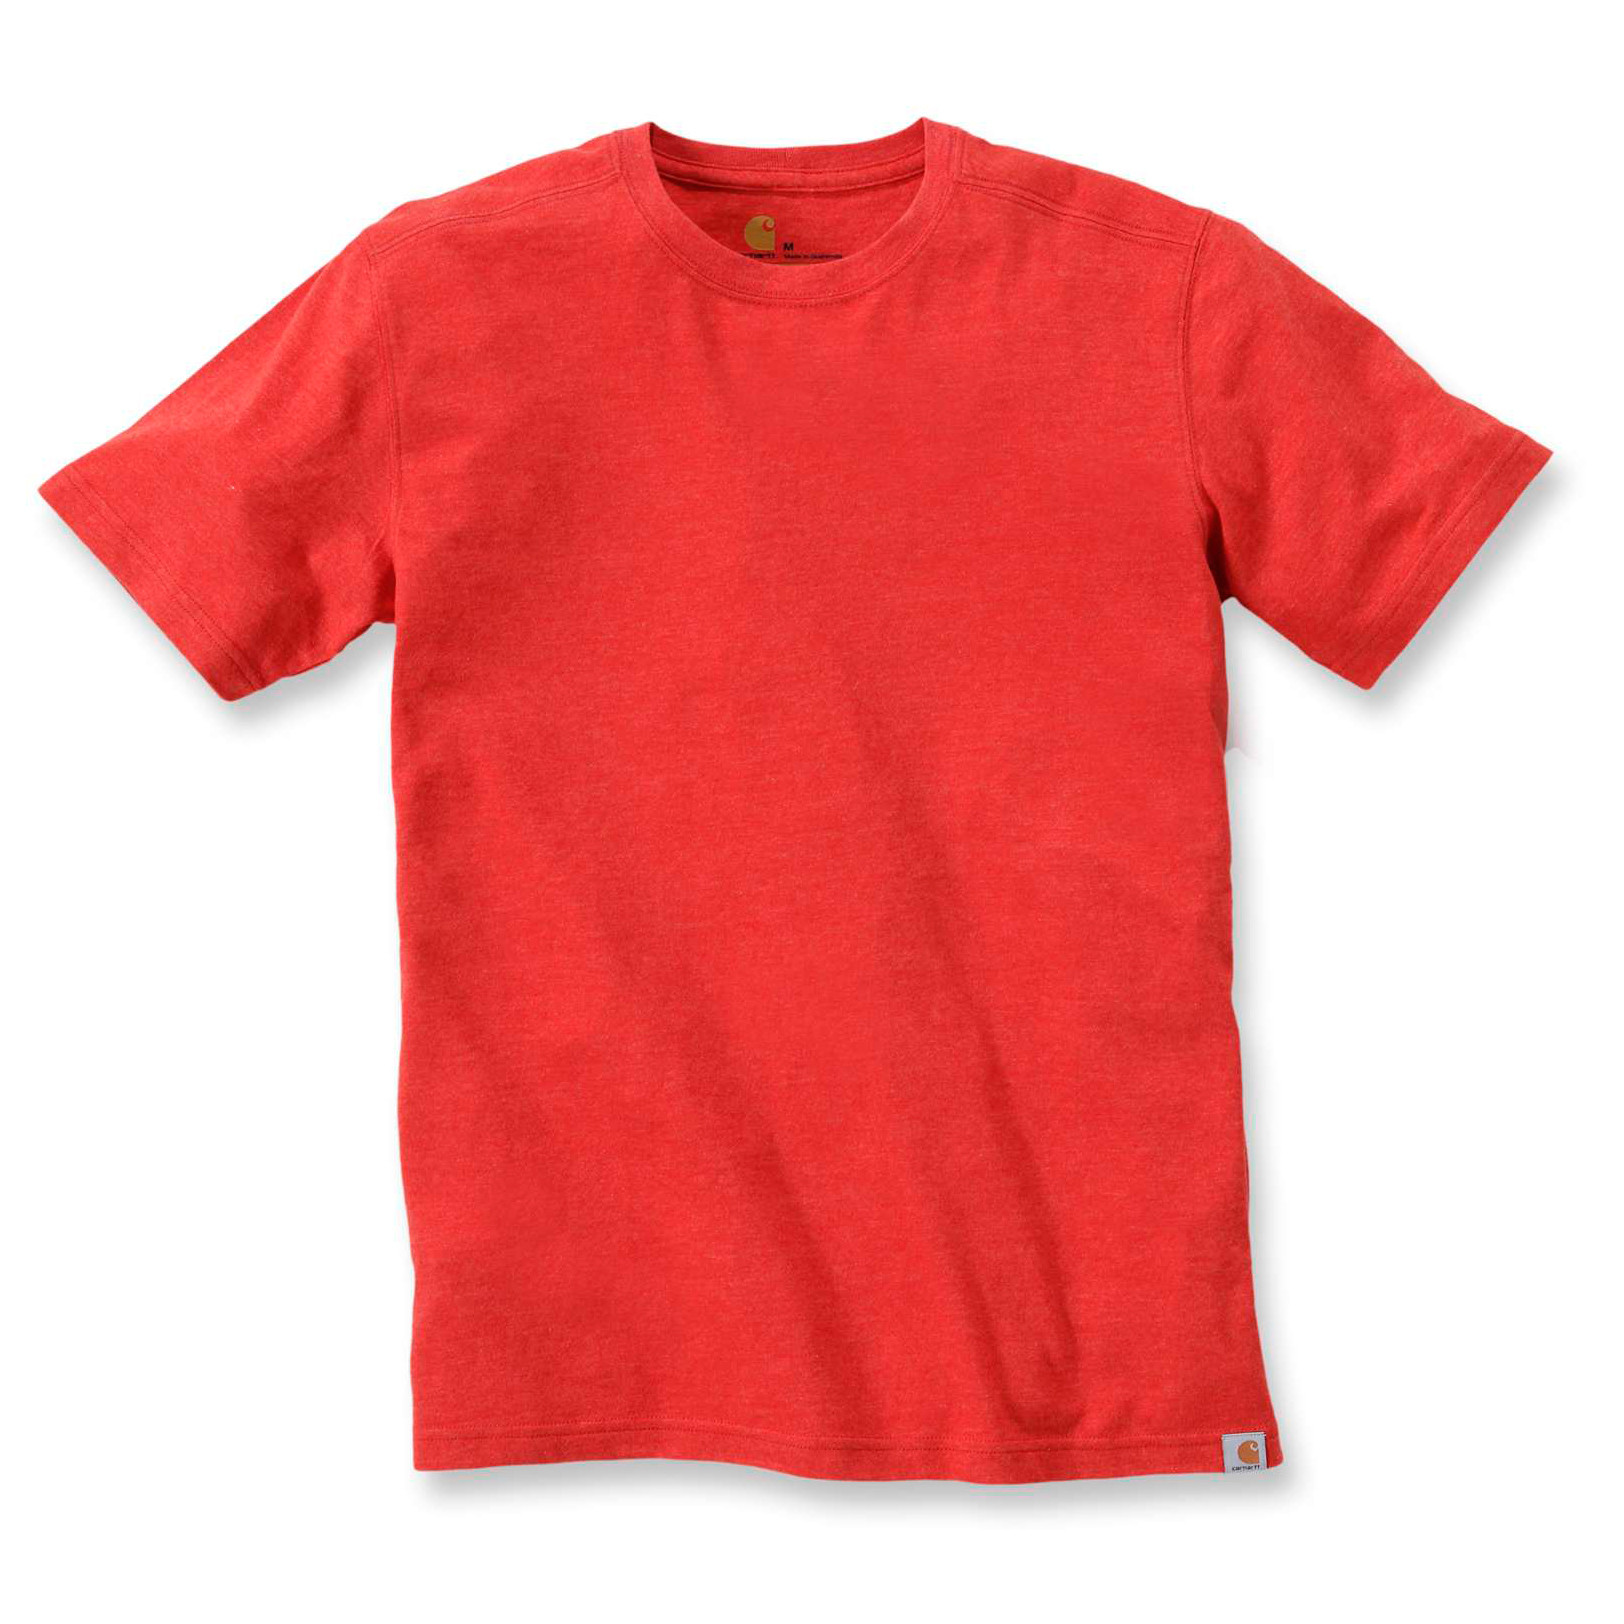 Футболка Carhartt Maddock T-Shirt S/S - 101124 (Chili Heather)